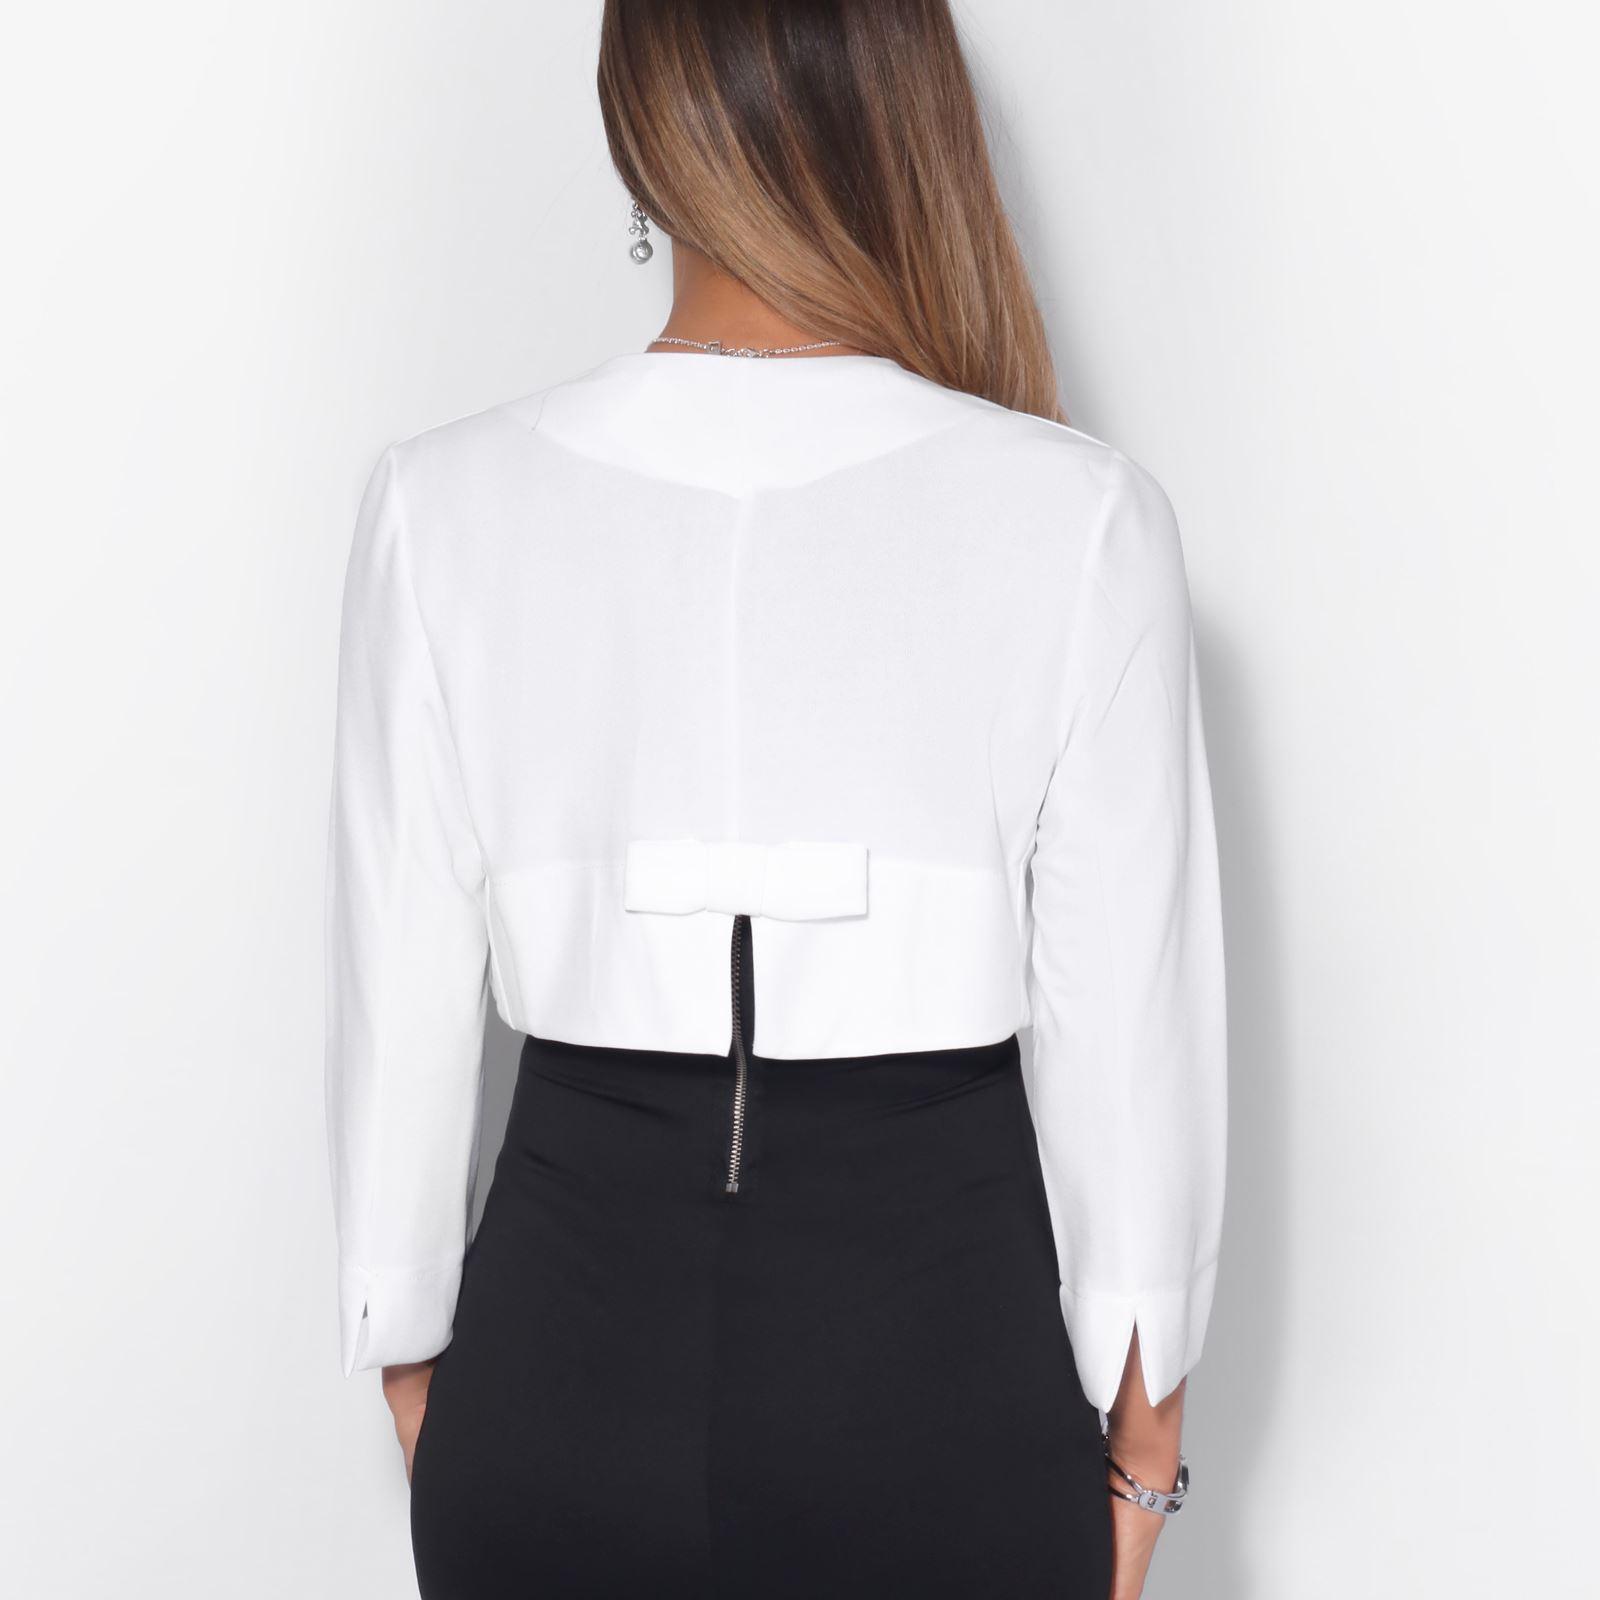 Womens-Ladies-Bolero-Shrug-Crop-Top-Open-Fit-Blazer-Evening-Bow-Jacket-Wedding thumbnail 21